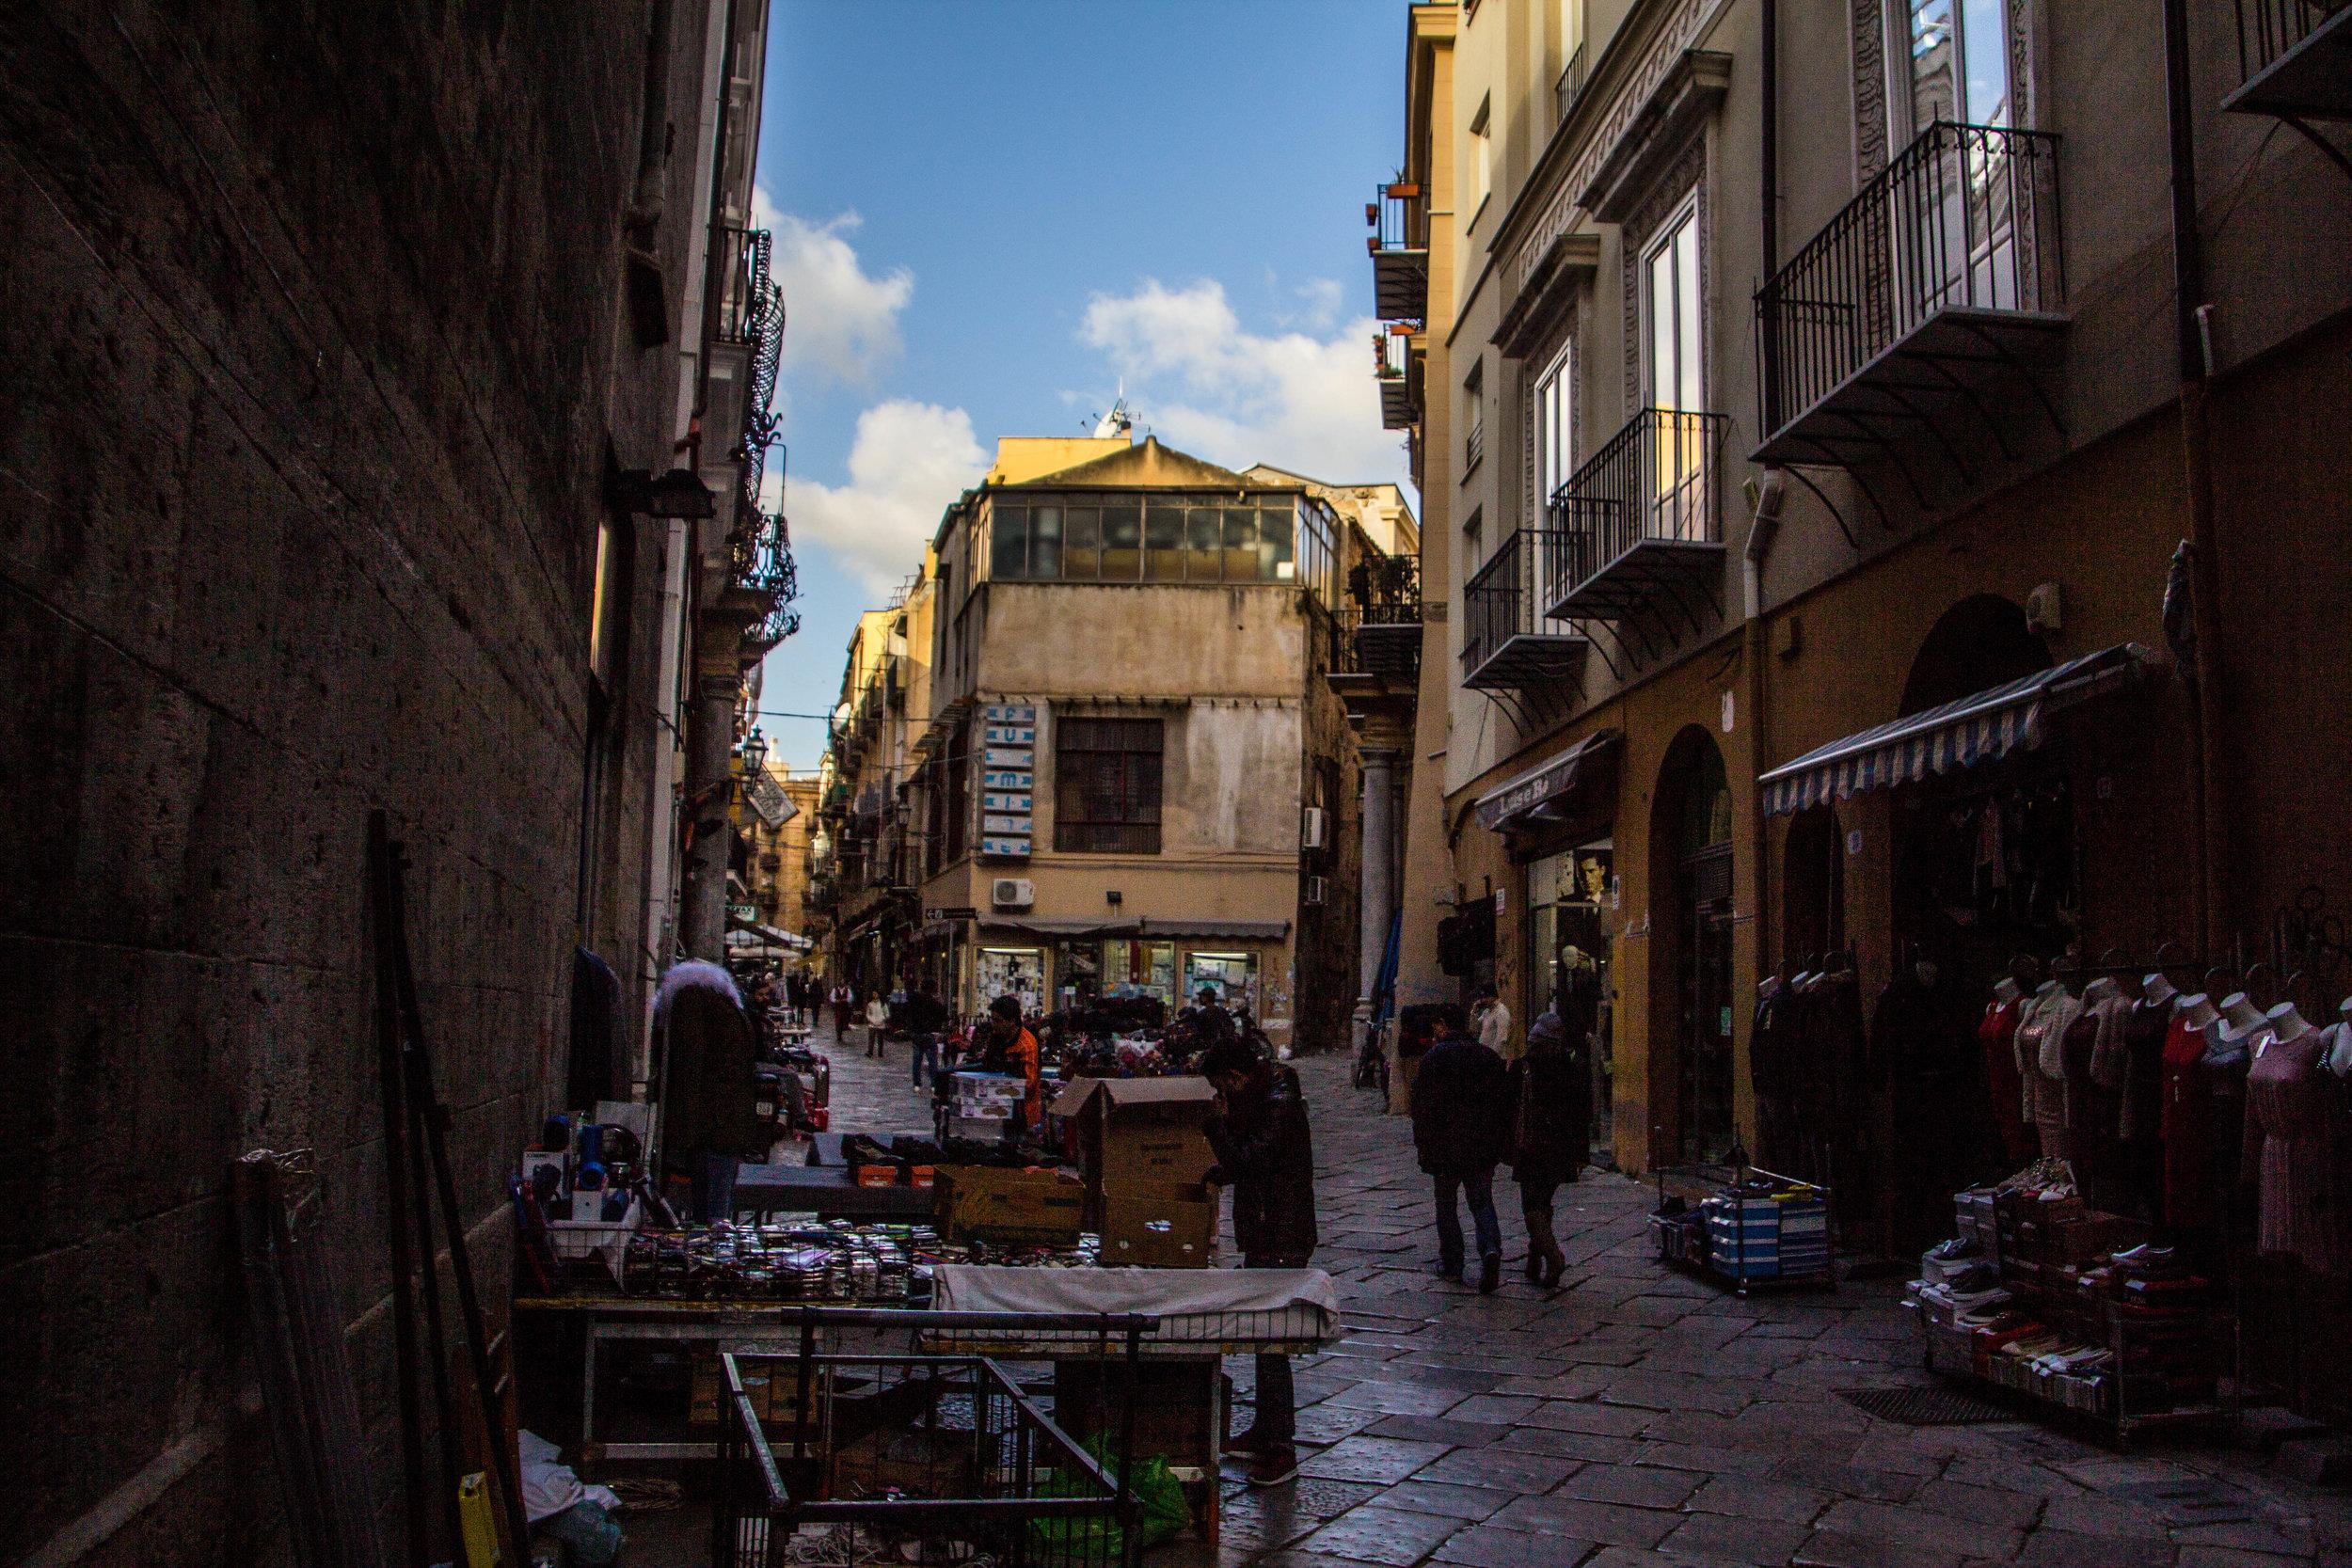 street-photography-palermo-sicily-52.jpg